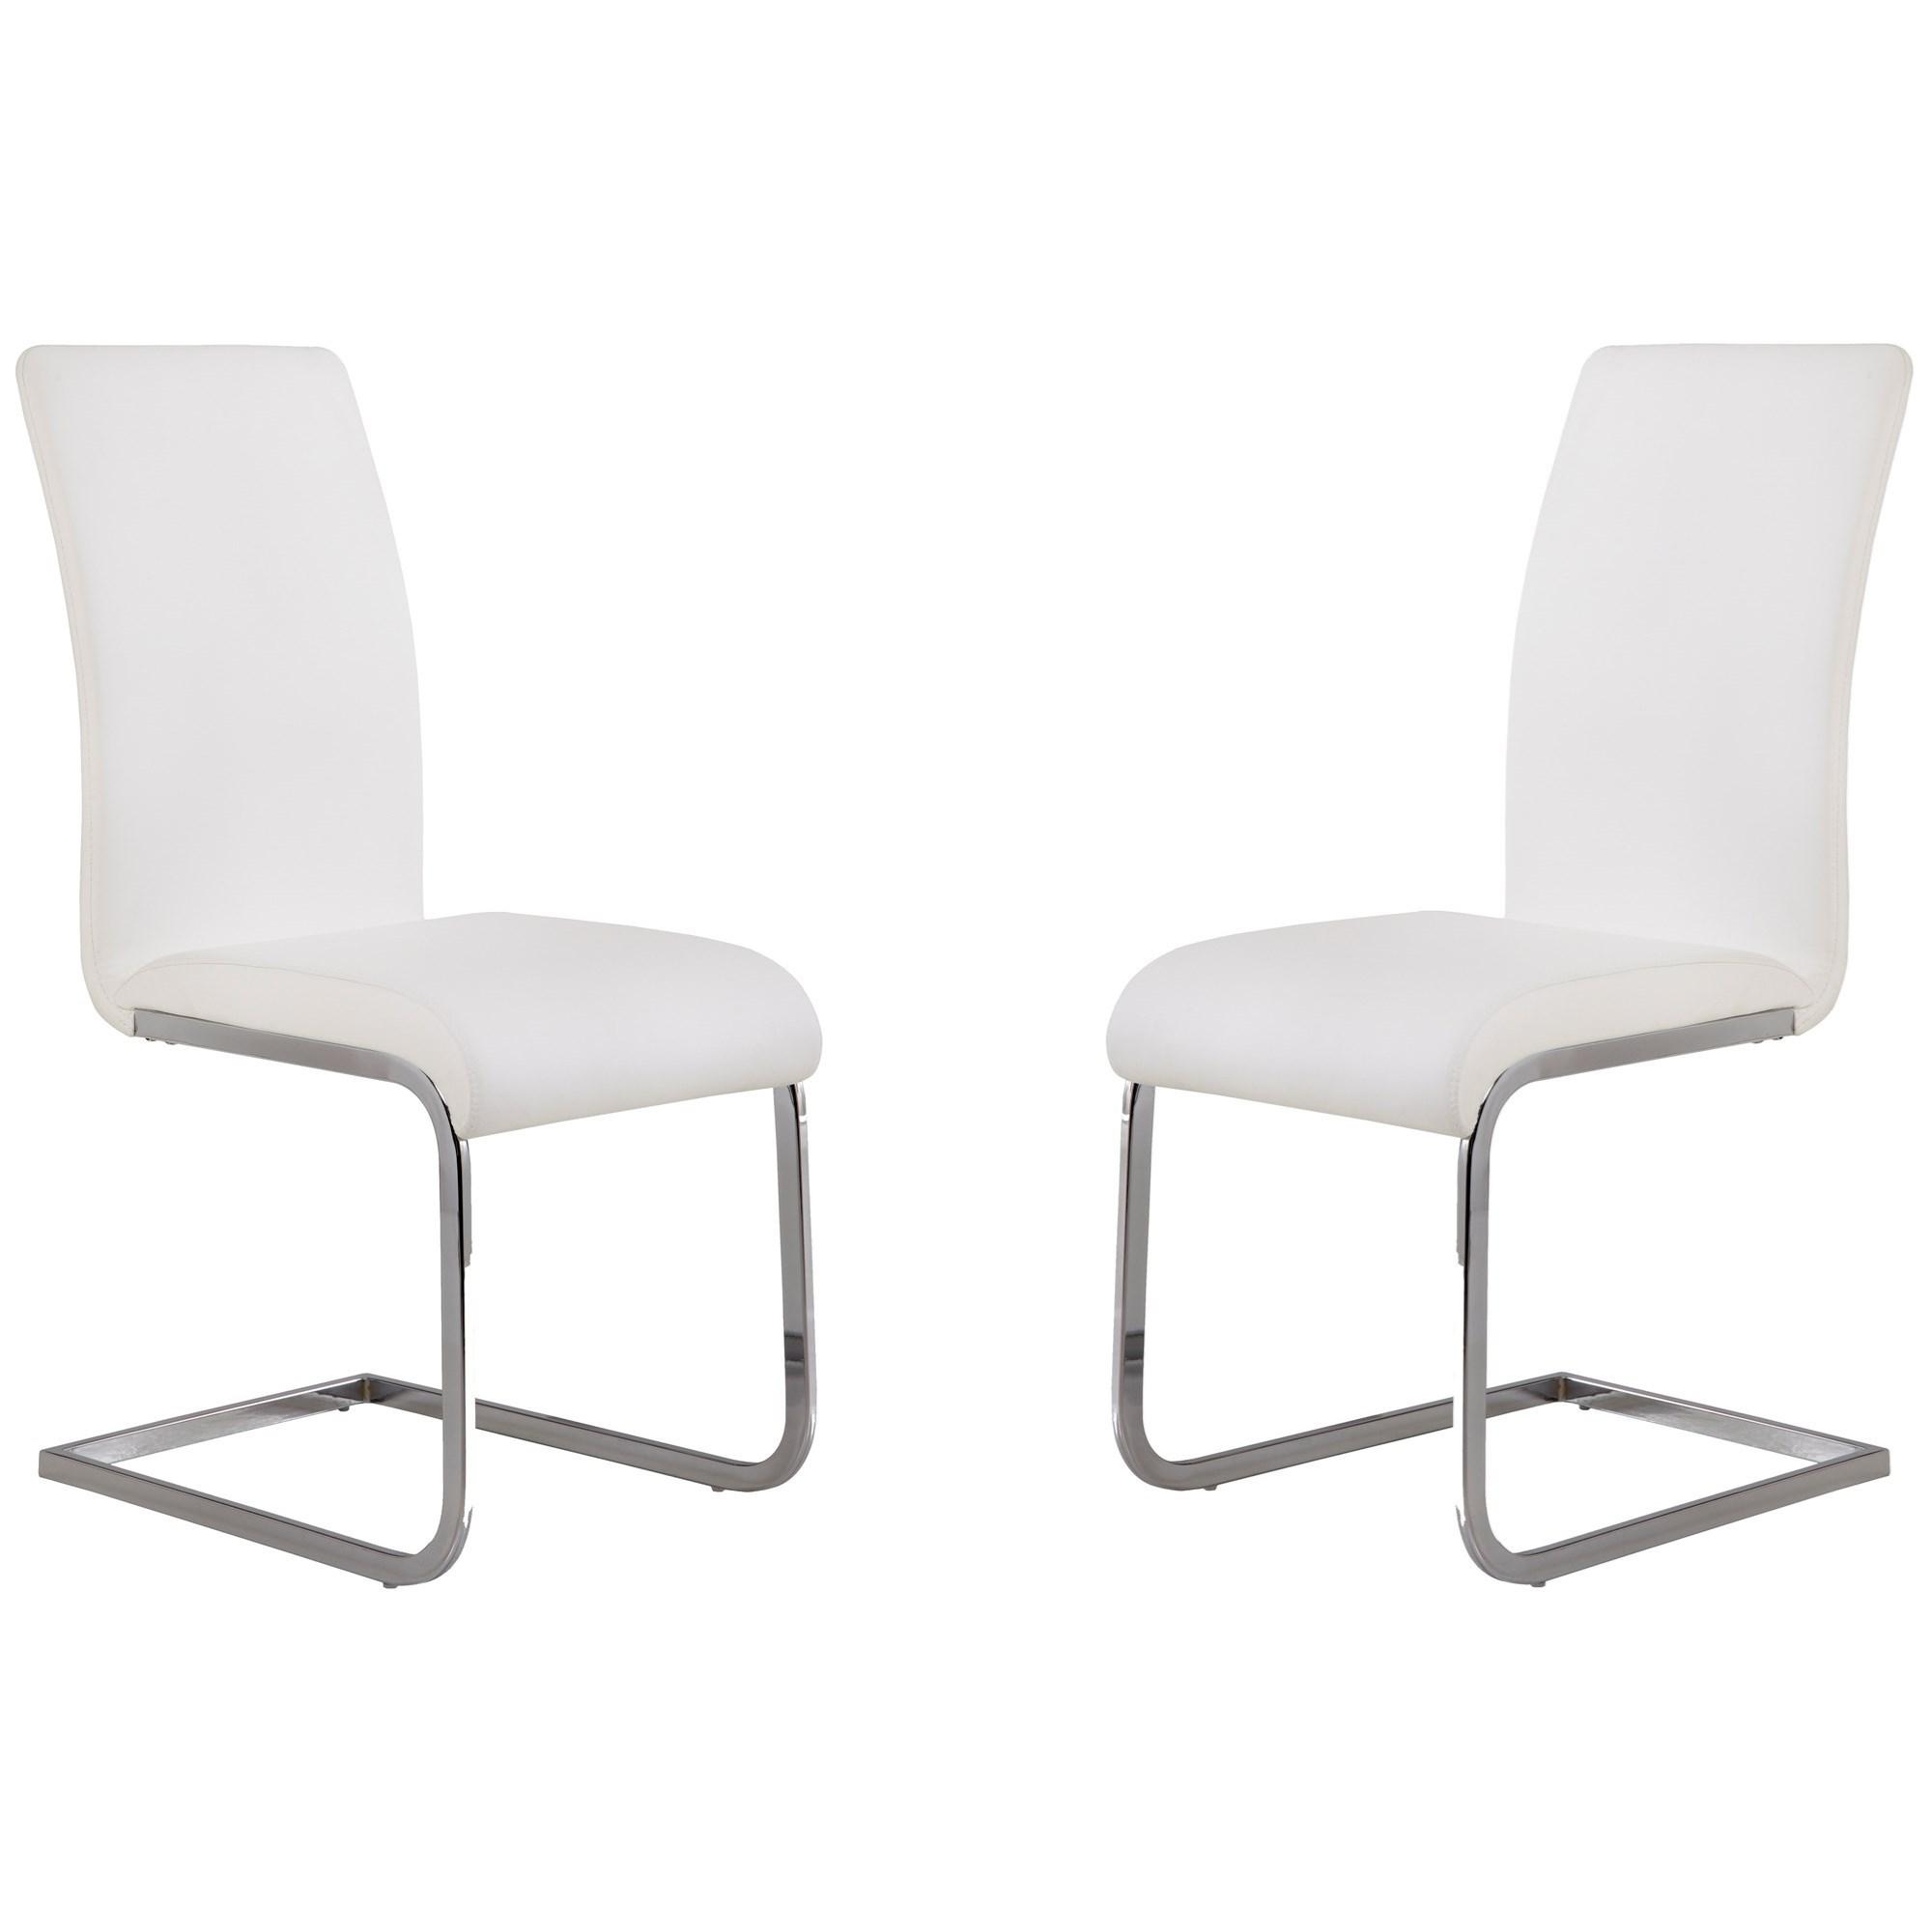 Amanda Side Chair - Set of 2 at Sadler's Home Furnishings